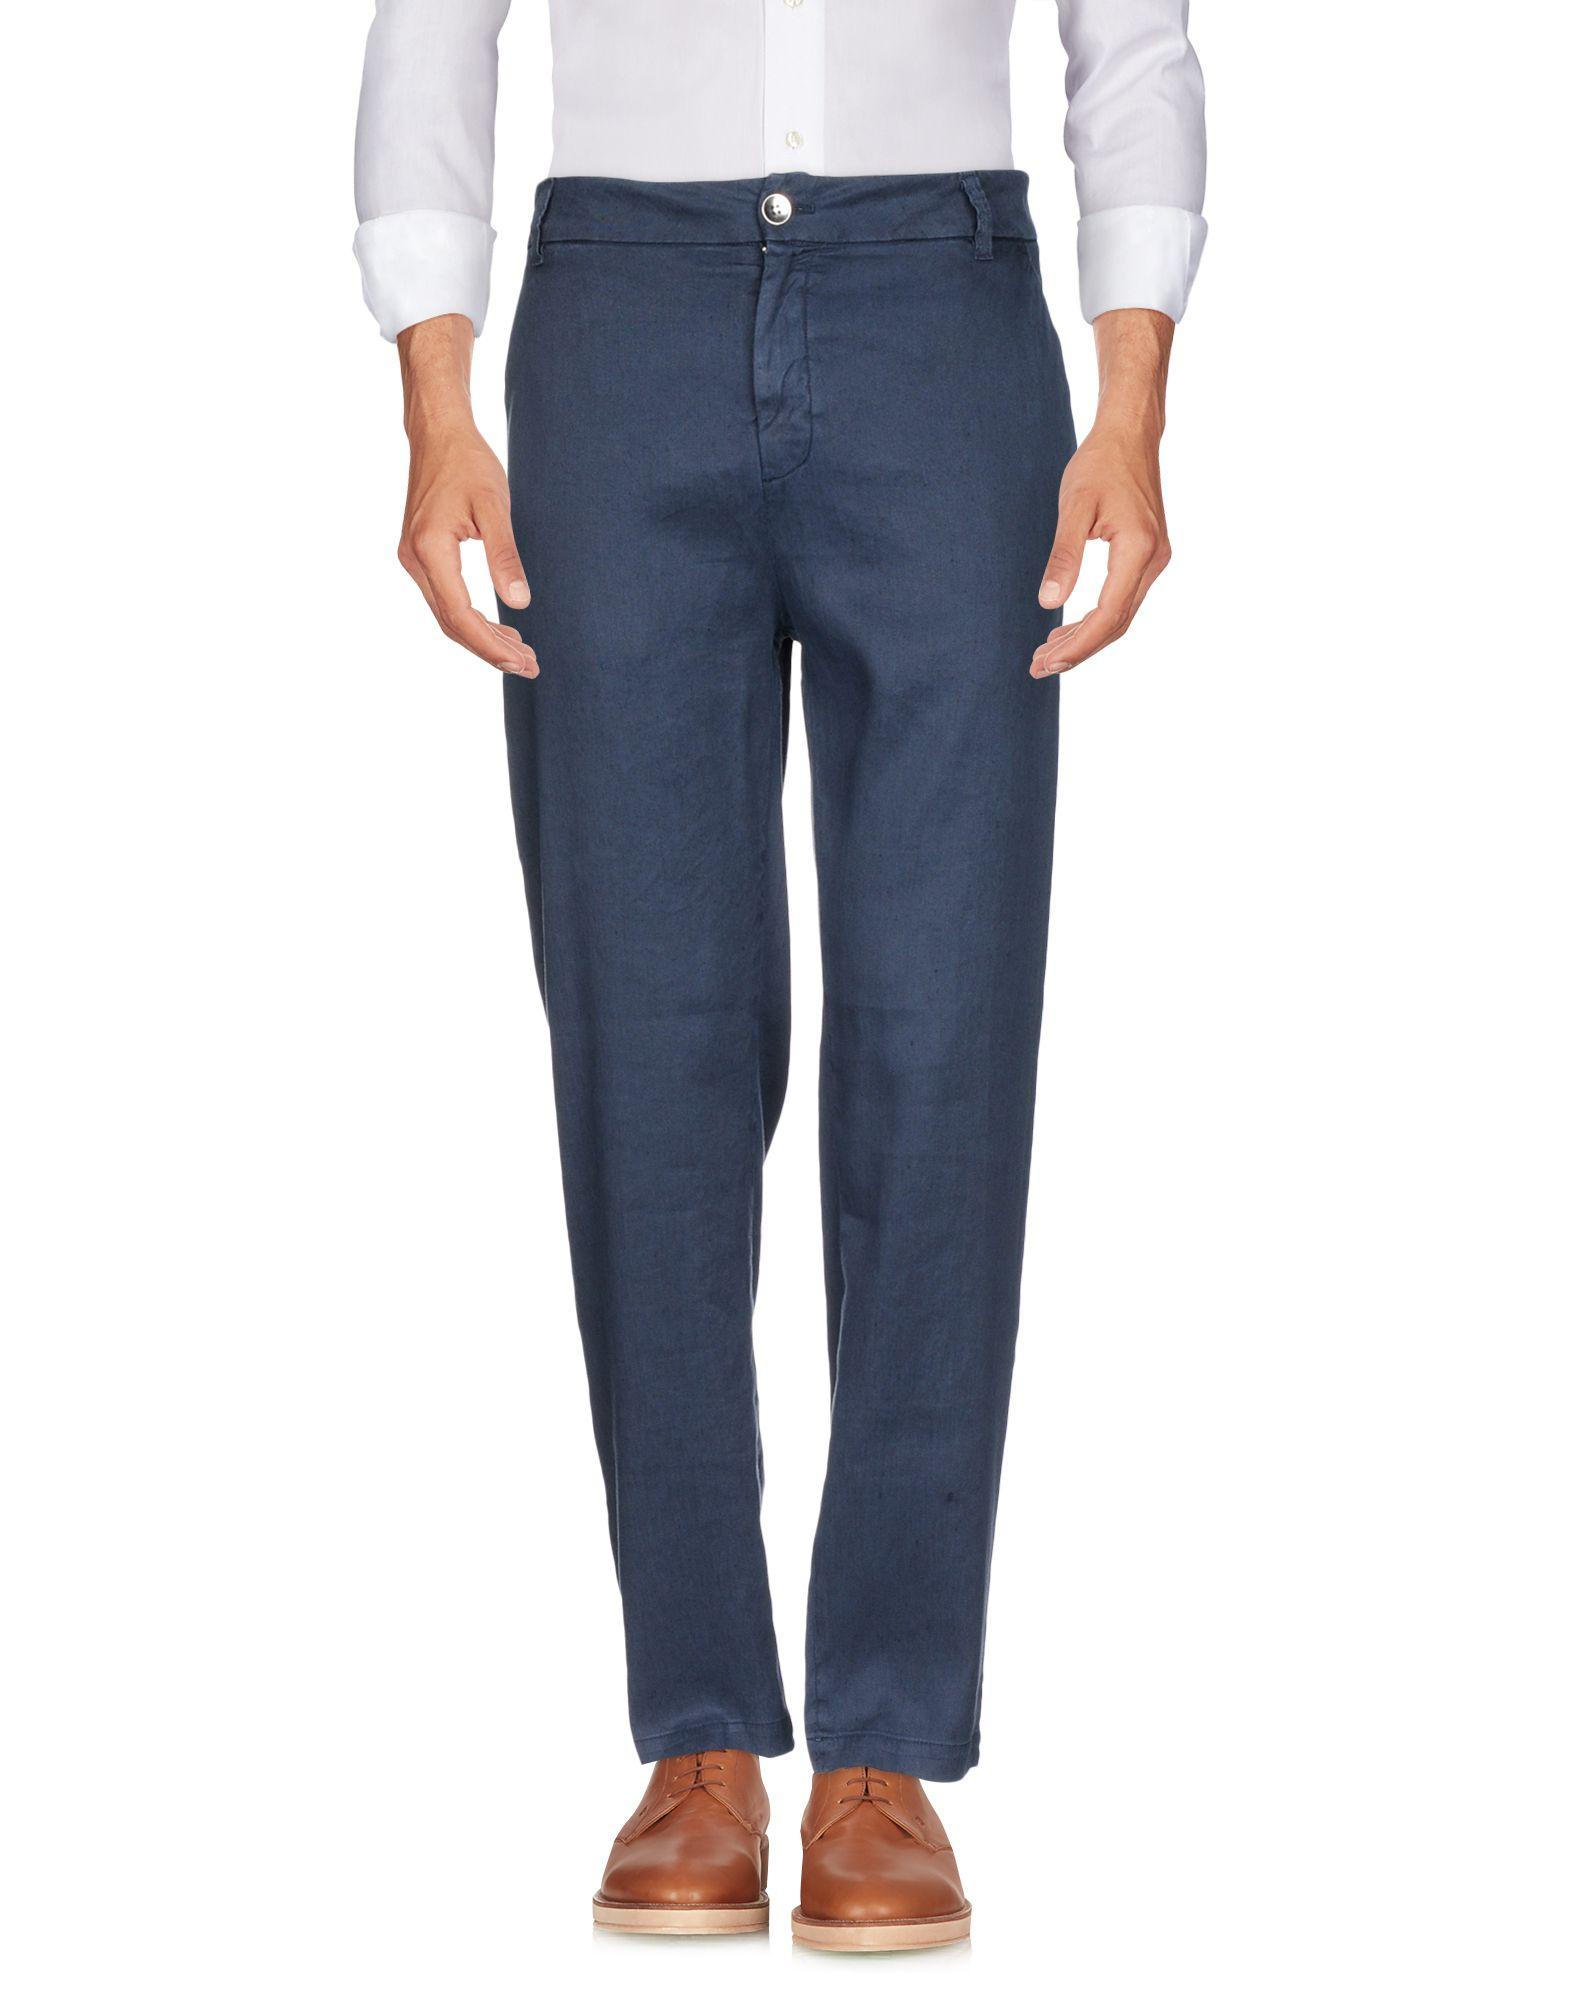 MASON'S Casual Pants in Dark Blue